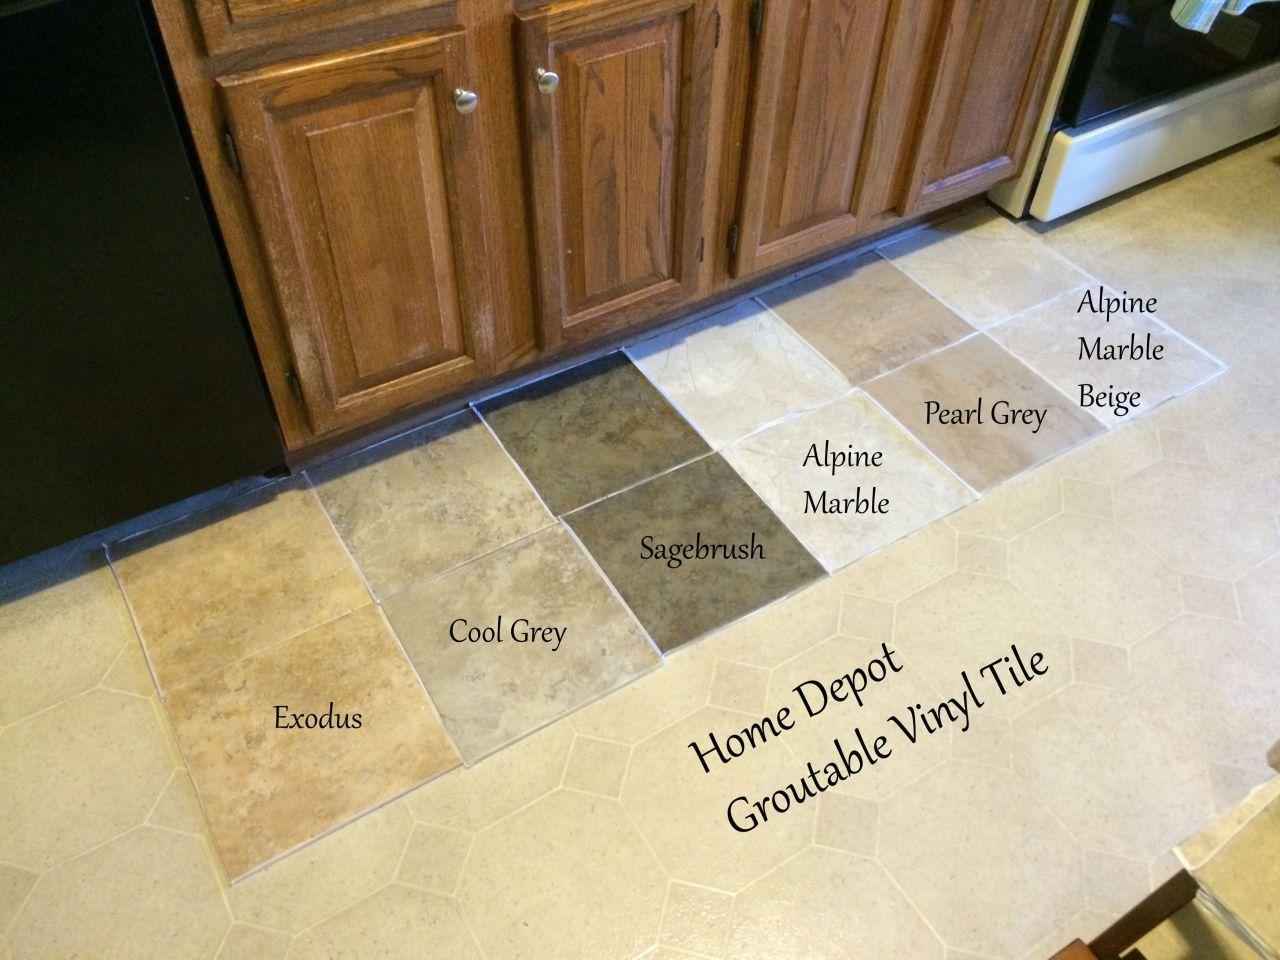 How To Remove Backsplash Tiles In 2020 Vinyl Sheet Flooring Groutable Vinyl Tile Vinyl Tile Flooring